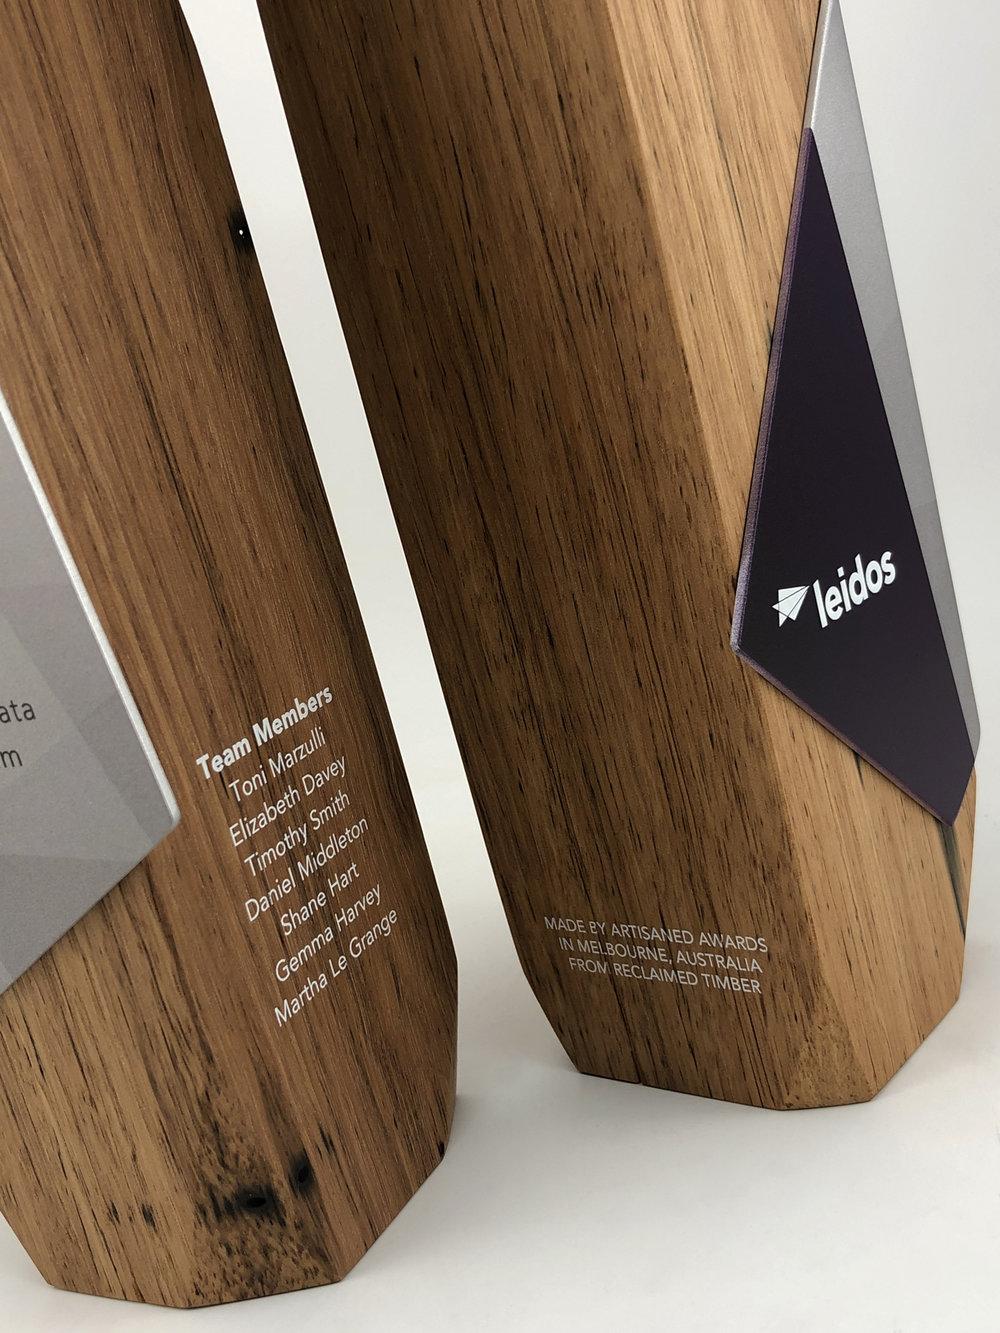 leidos-australia-values-awards-eco-reclaimed-timber-metal-trophy-07.jpg